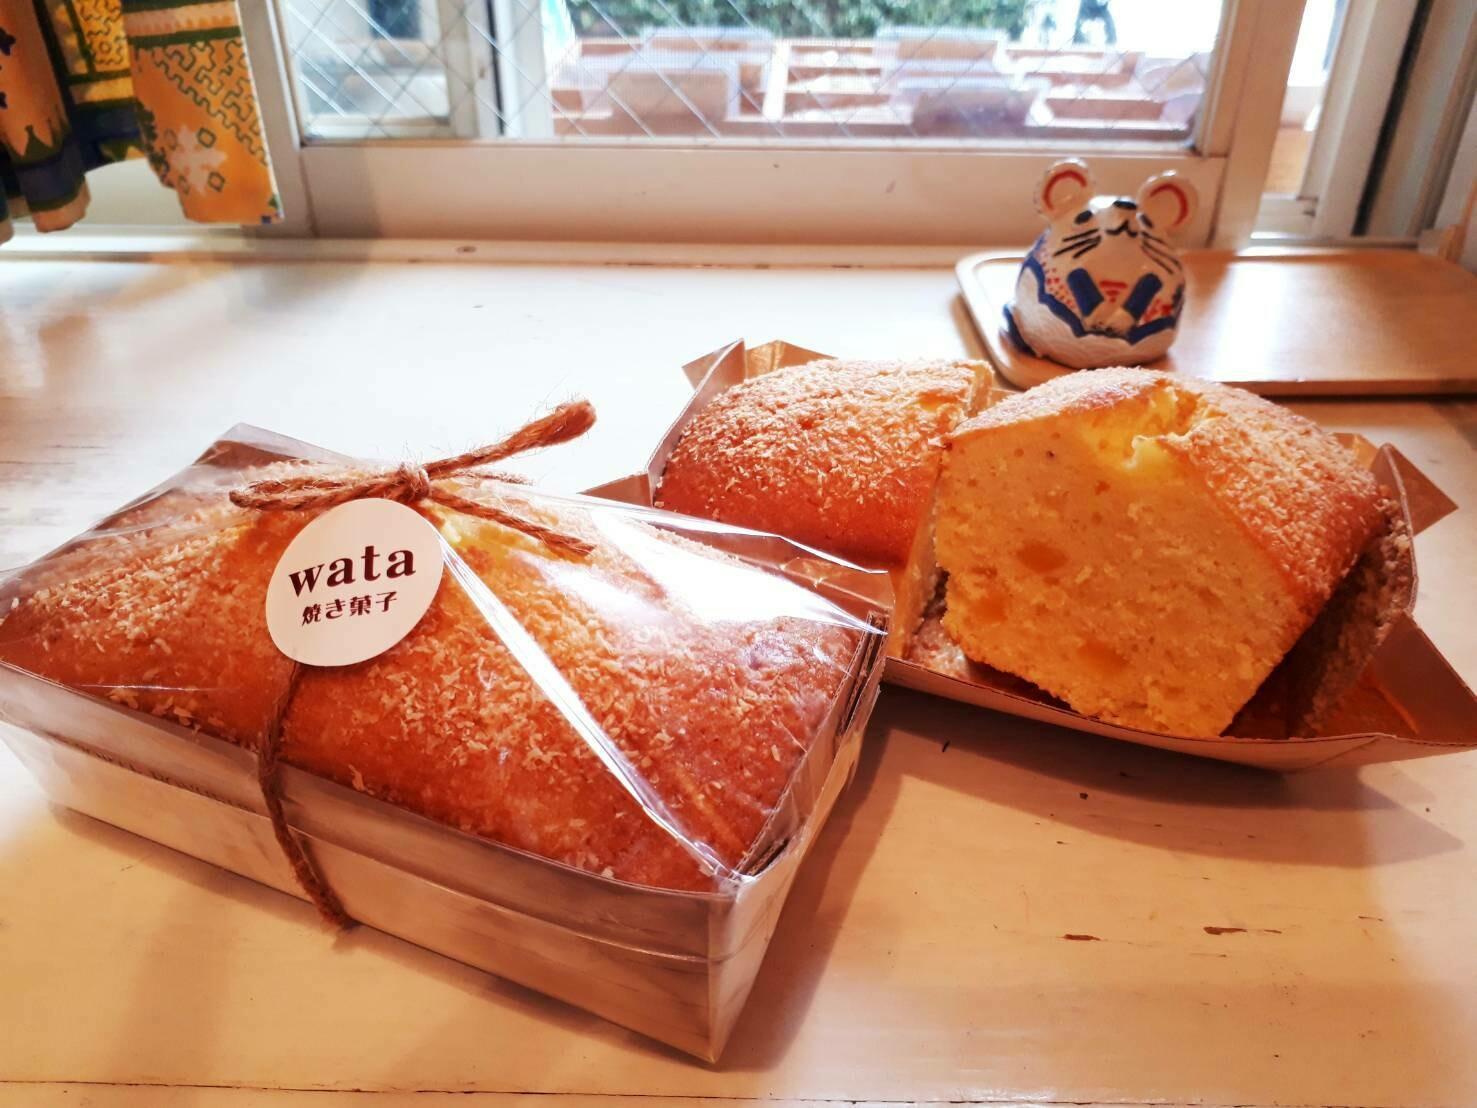 wata焼菓子 季節のパウンドケーキ(全日配達可)